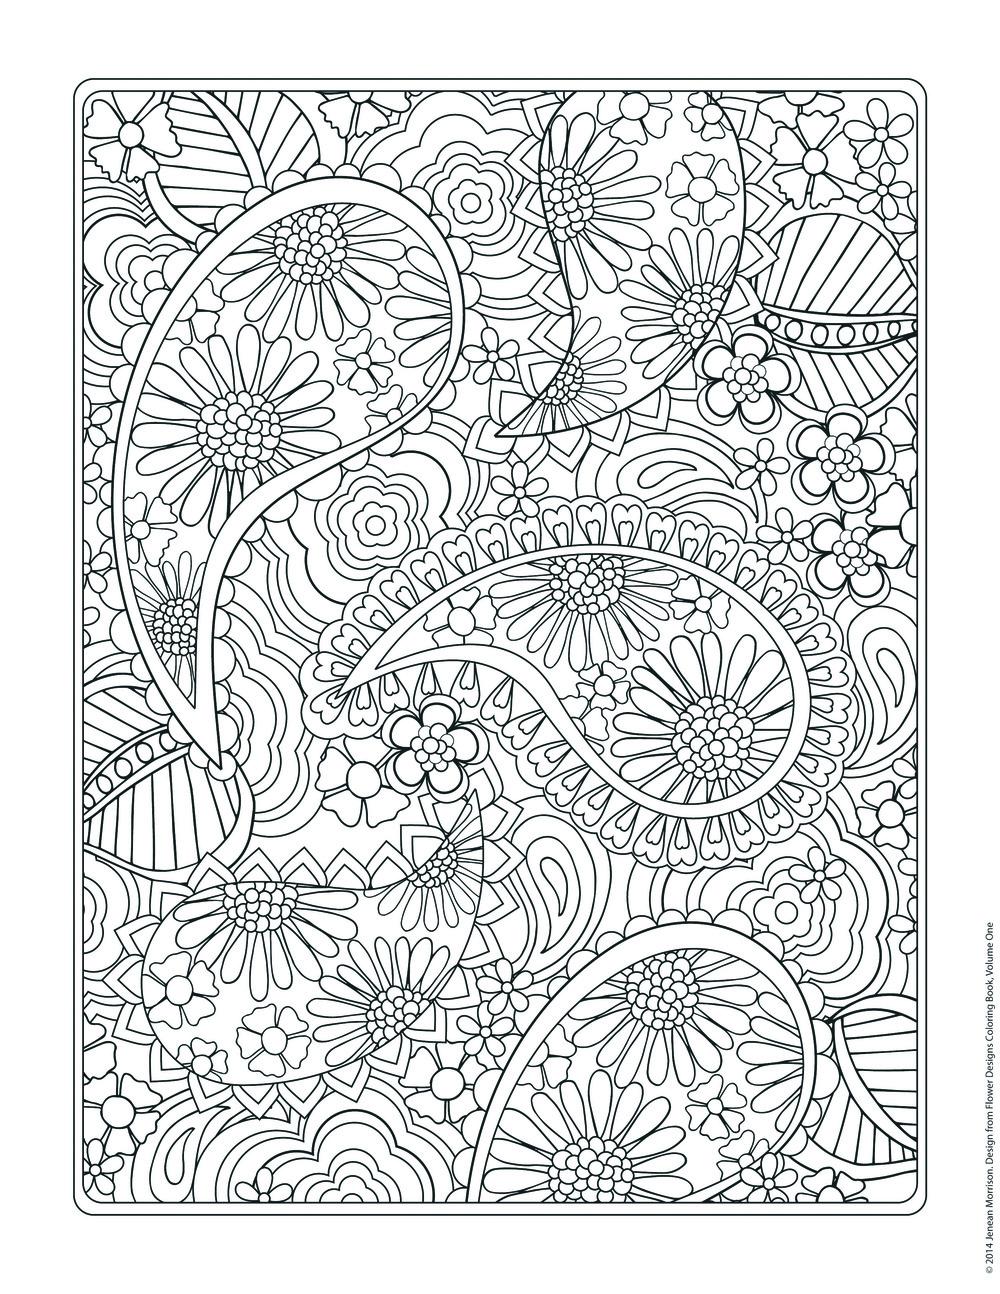 Flower Designs Coloring Book Jenean Morrison Art Design Design Pages To Color